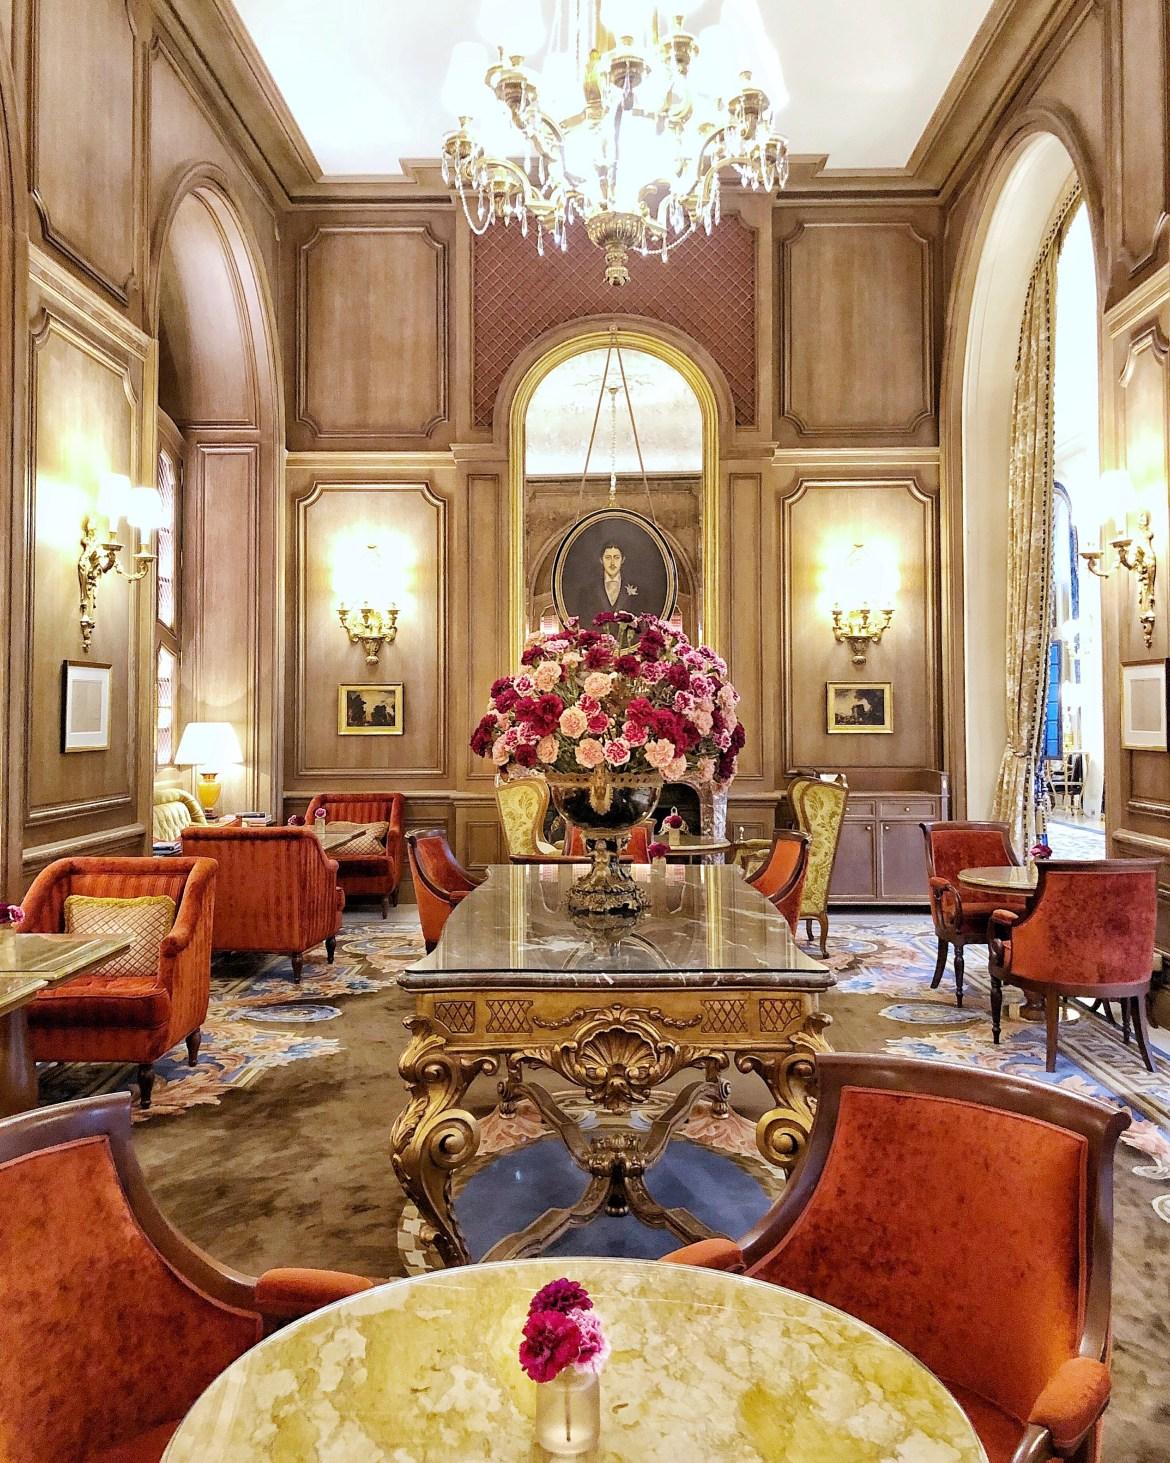 Eileen Callahan of champagne travels luxury travel writer